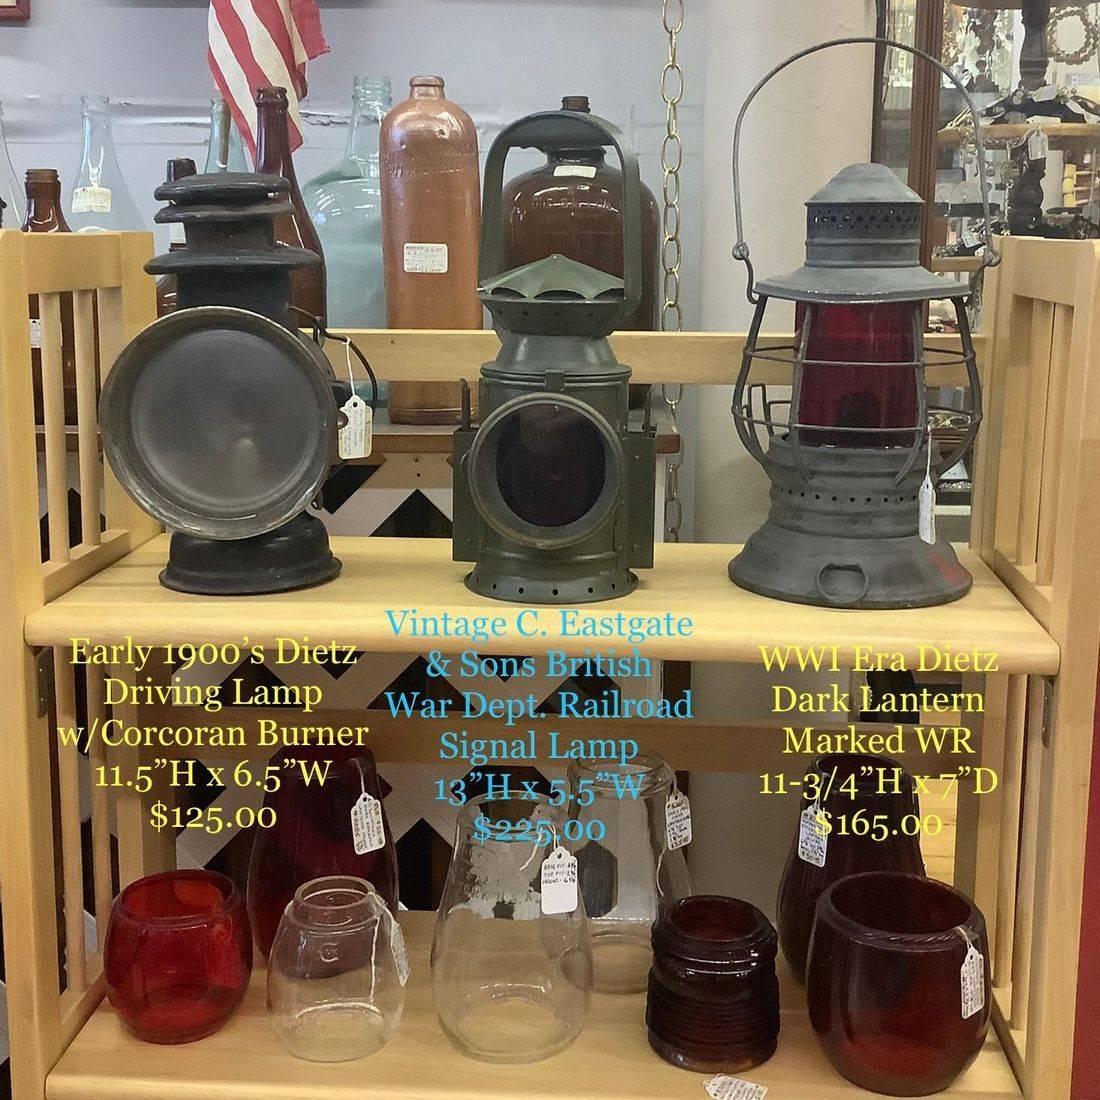 Vintage C. Eastgate & Sons, British War Dept., Railroad Signaling Lamp, w/ Red & Green Rotating Lenses   $225.00